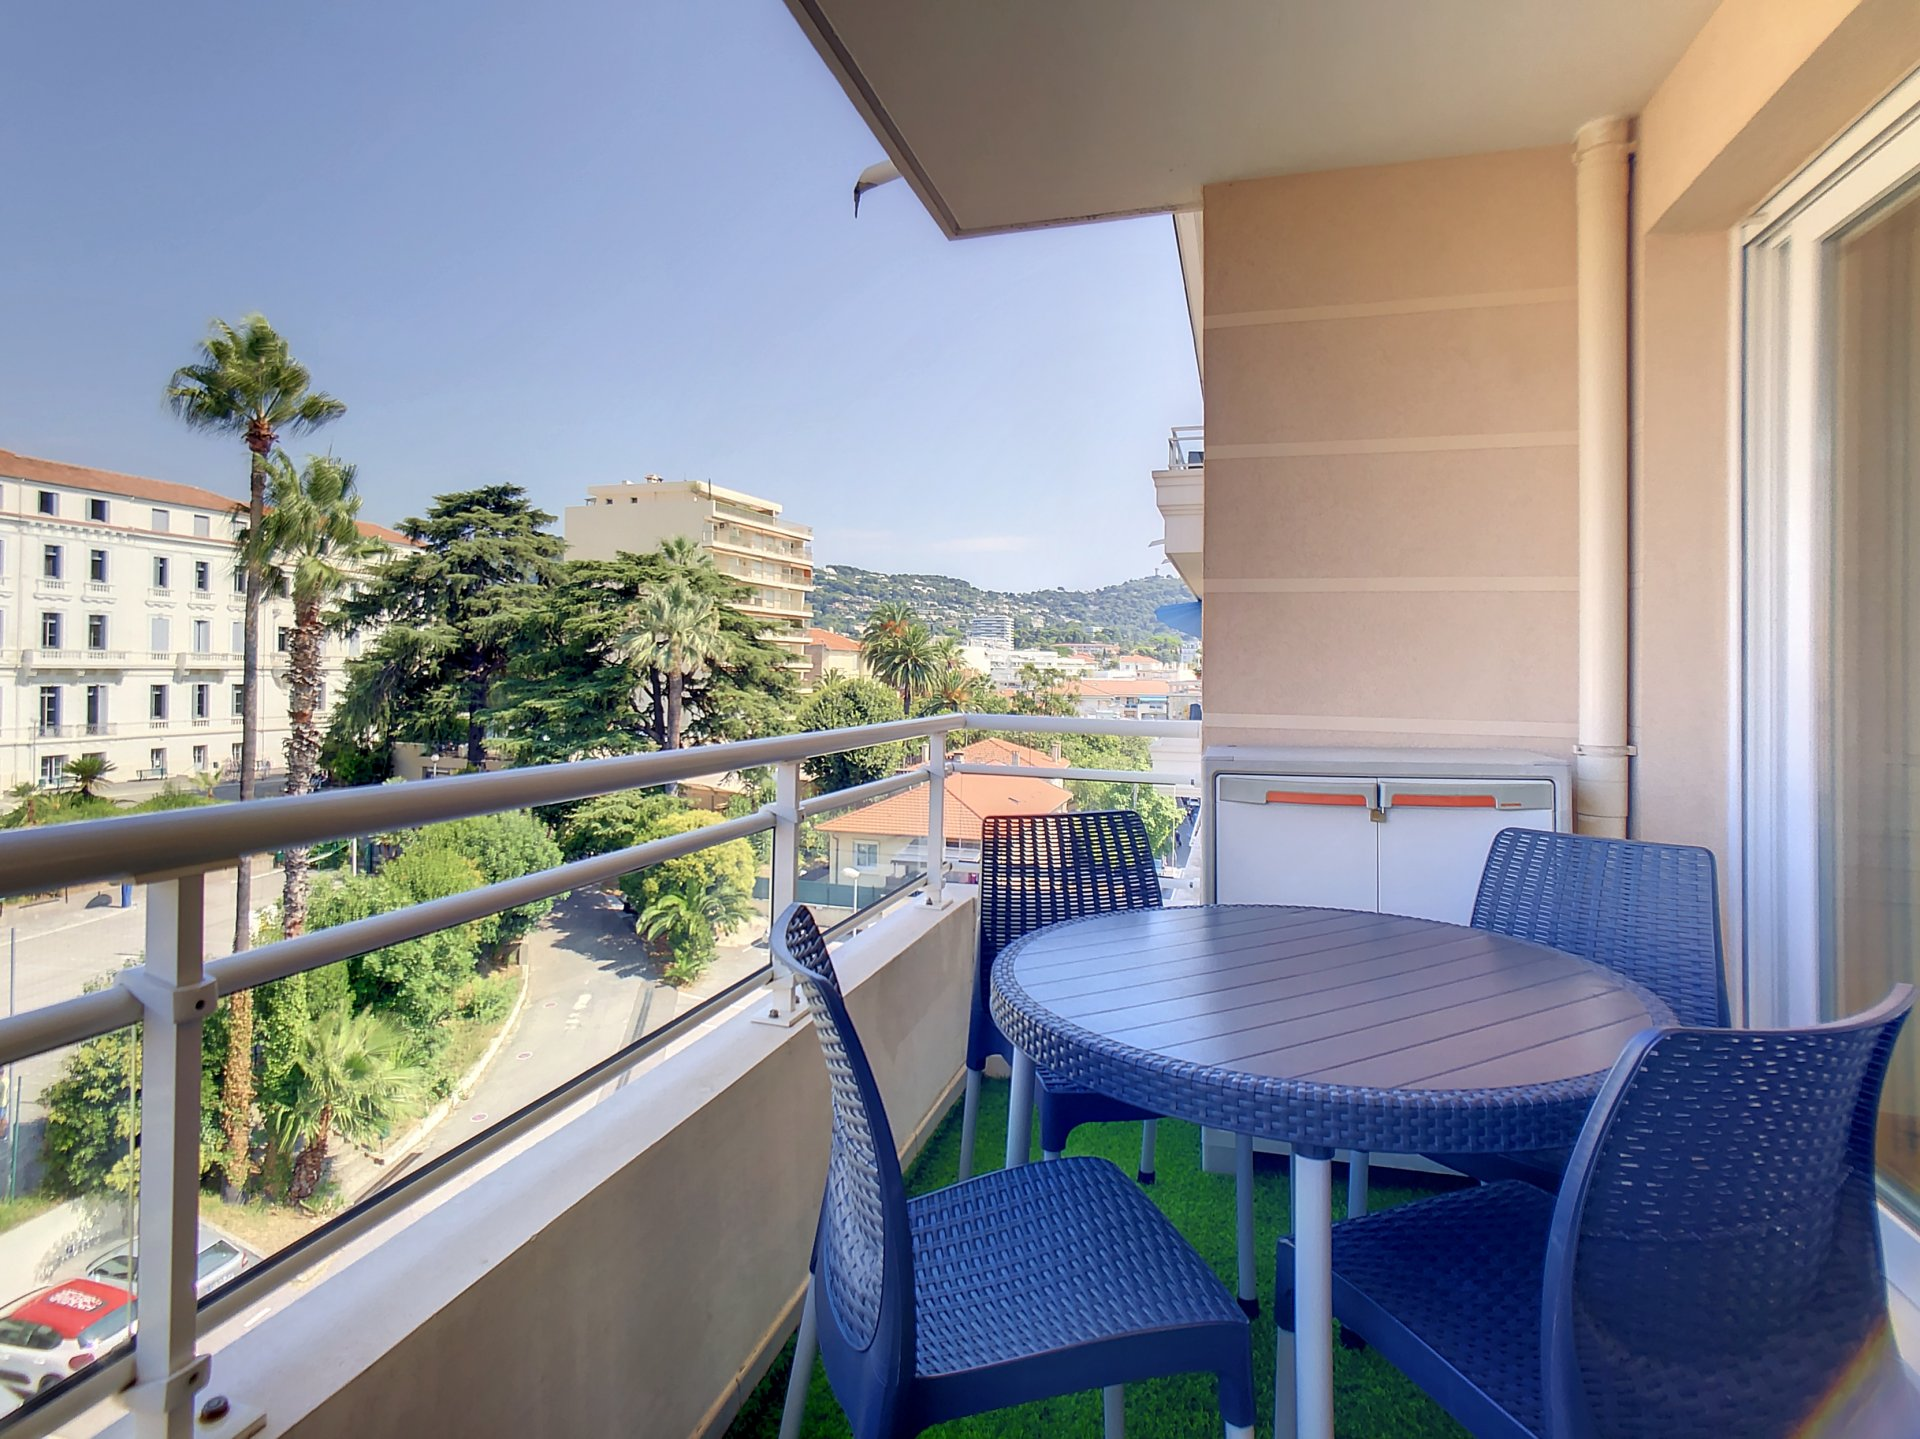 New building, high floor, nice one bedroom flat with terrace.